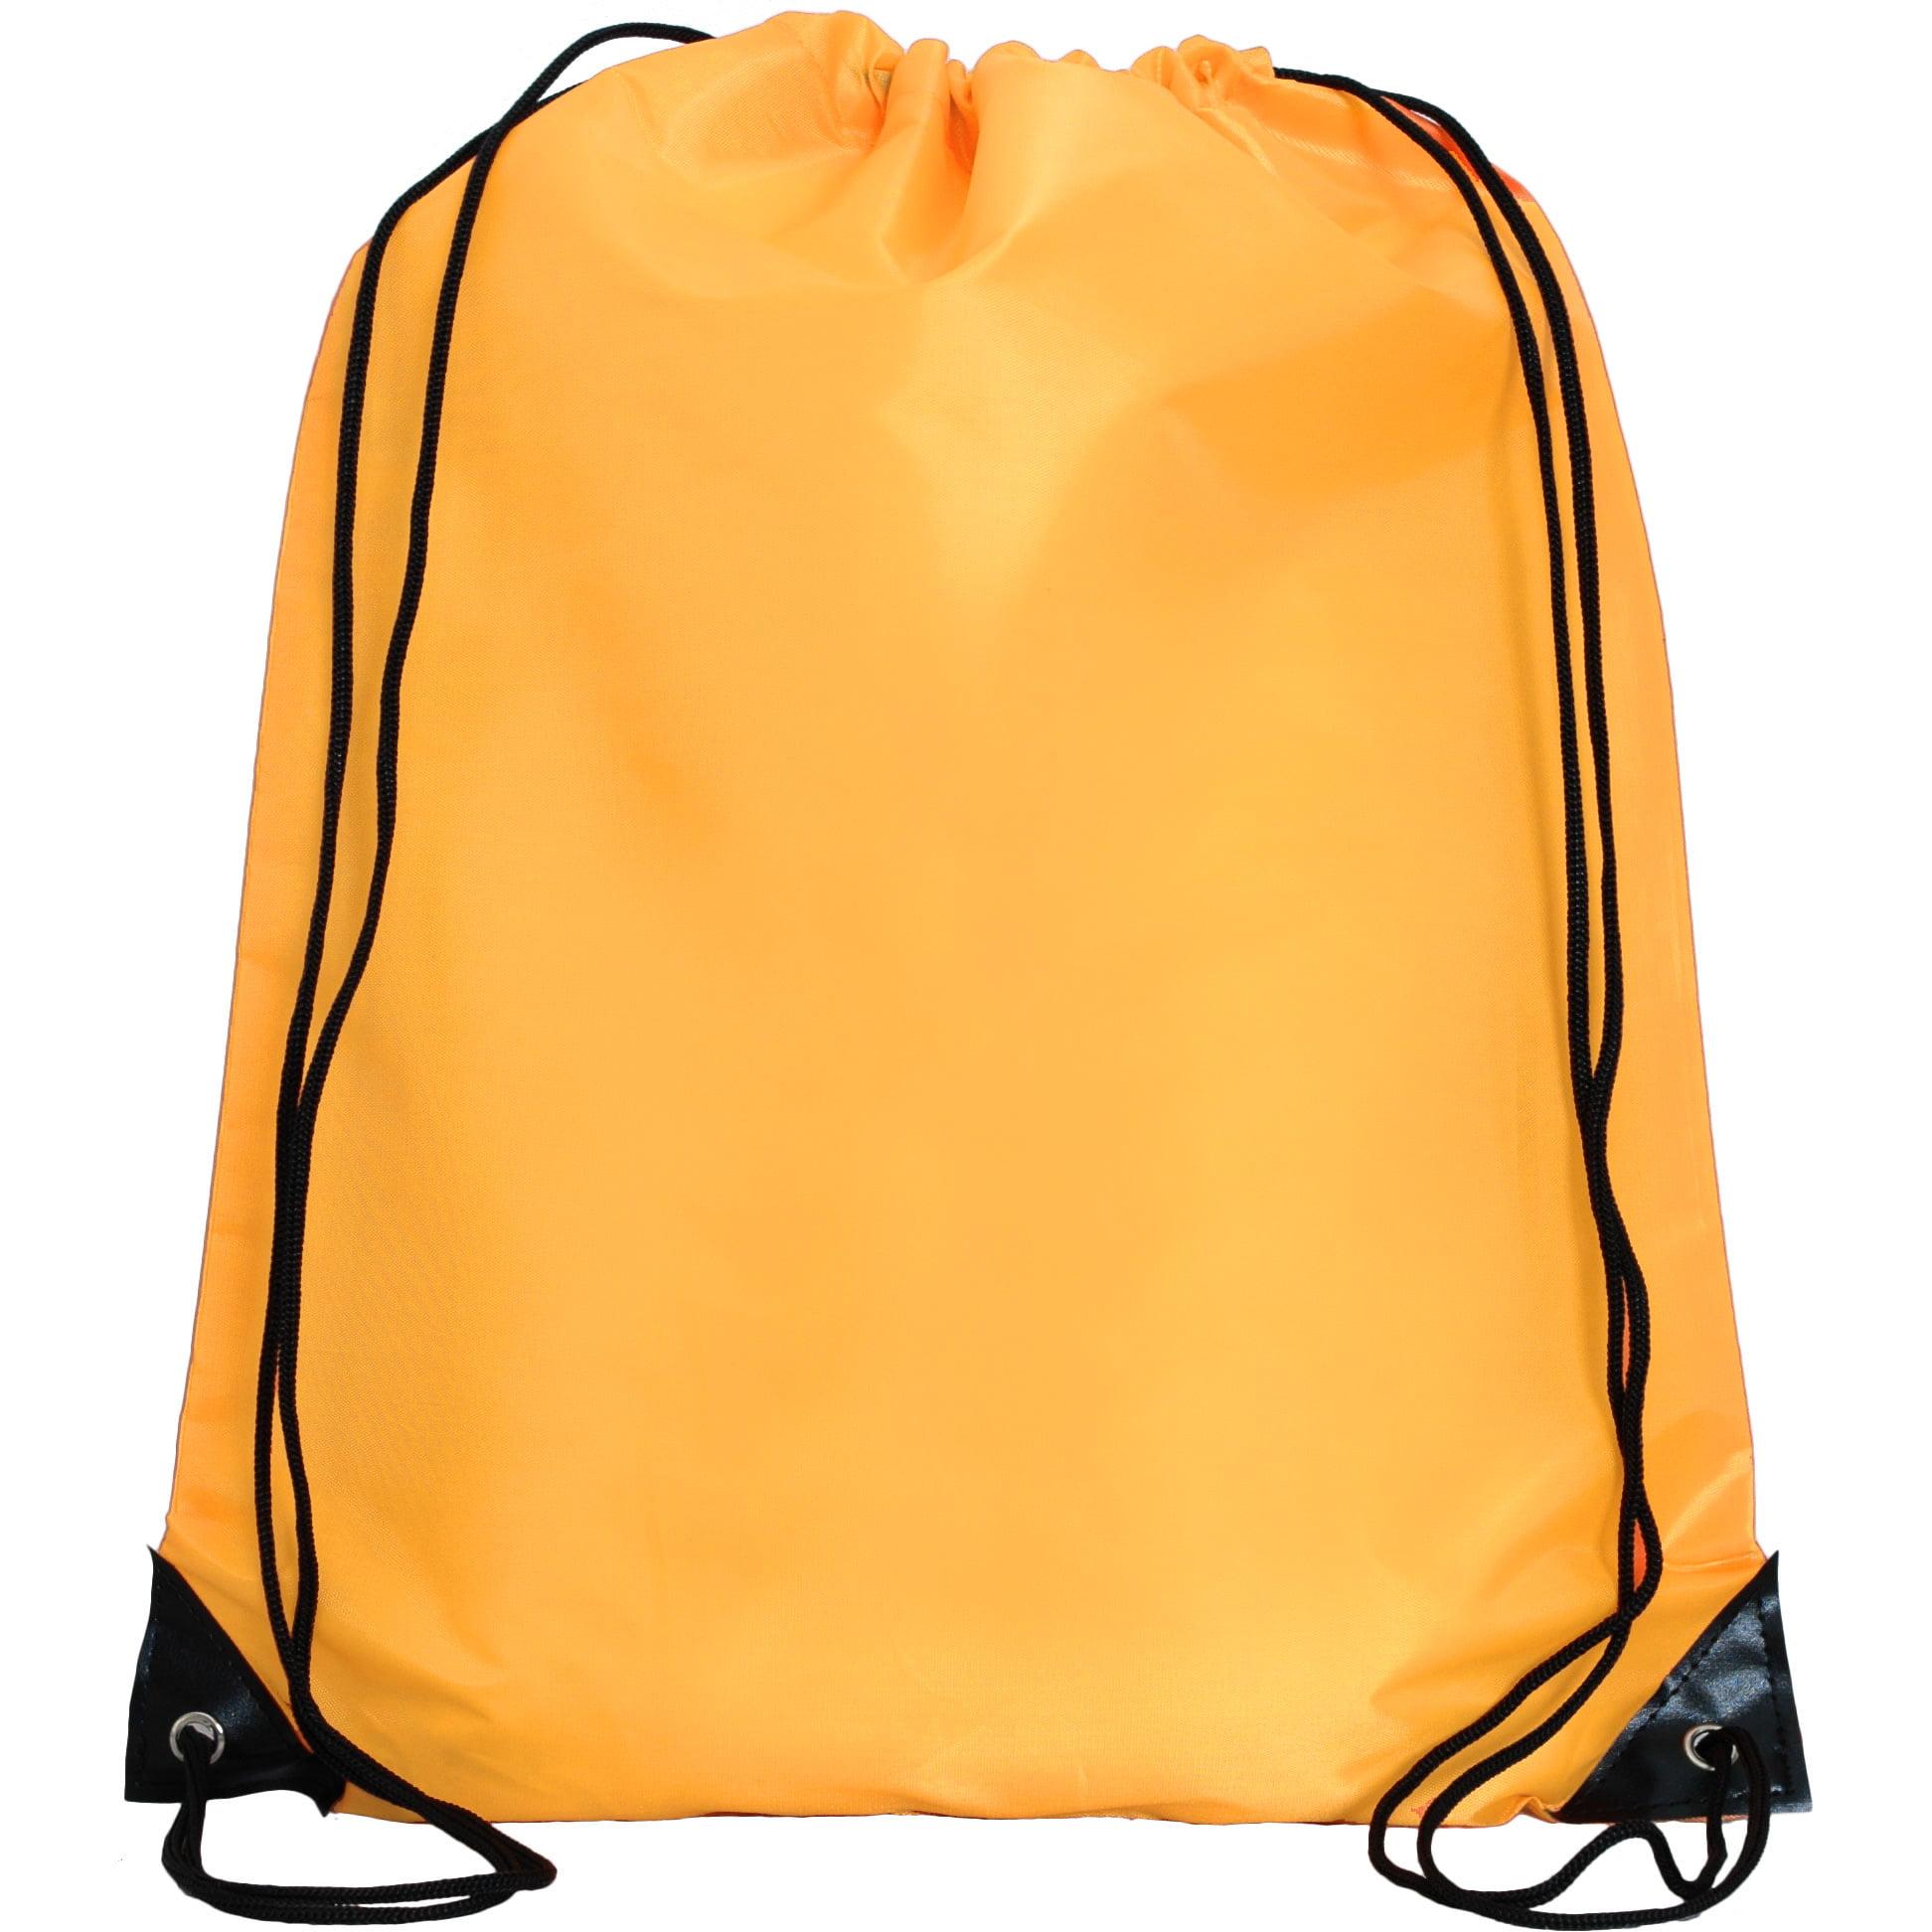 Threadart Drawstring Tote Bag